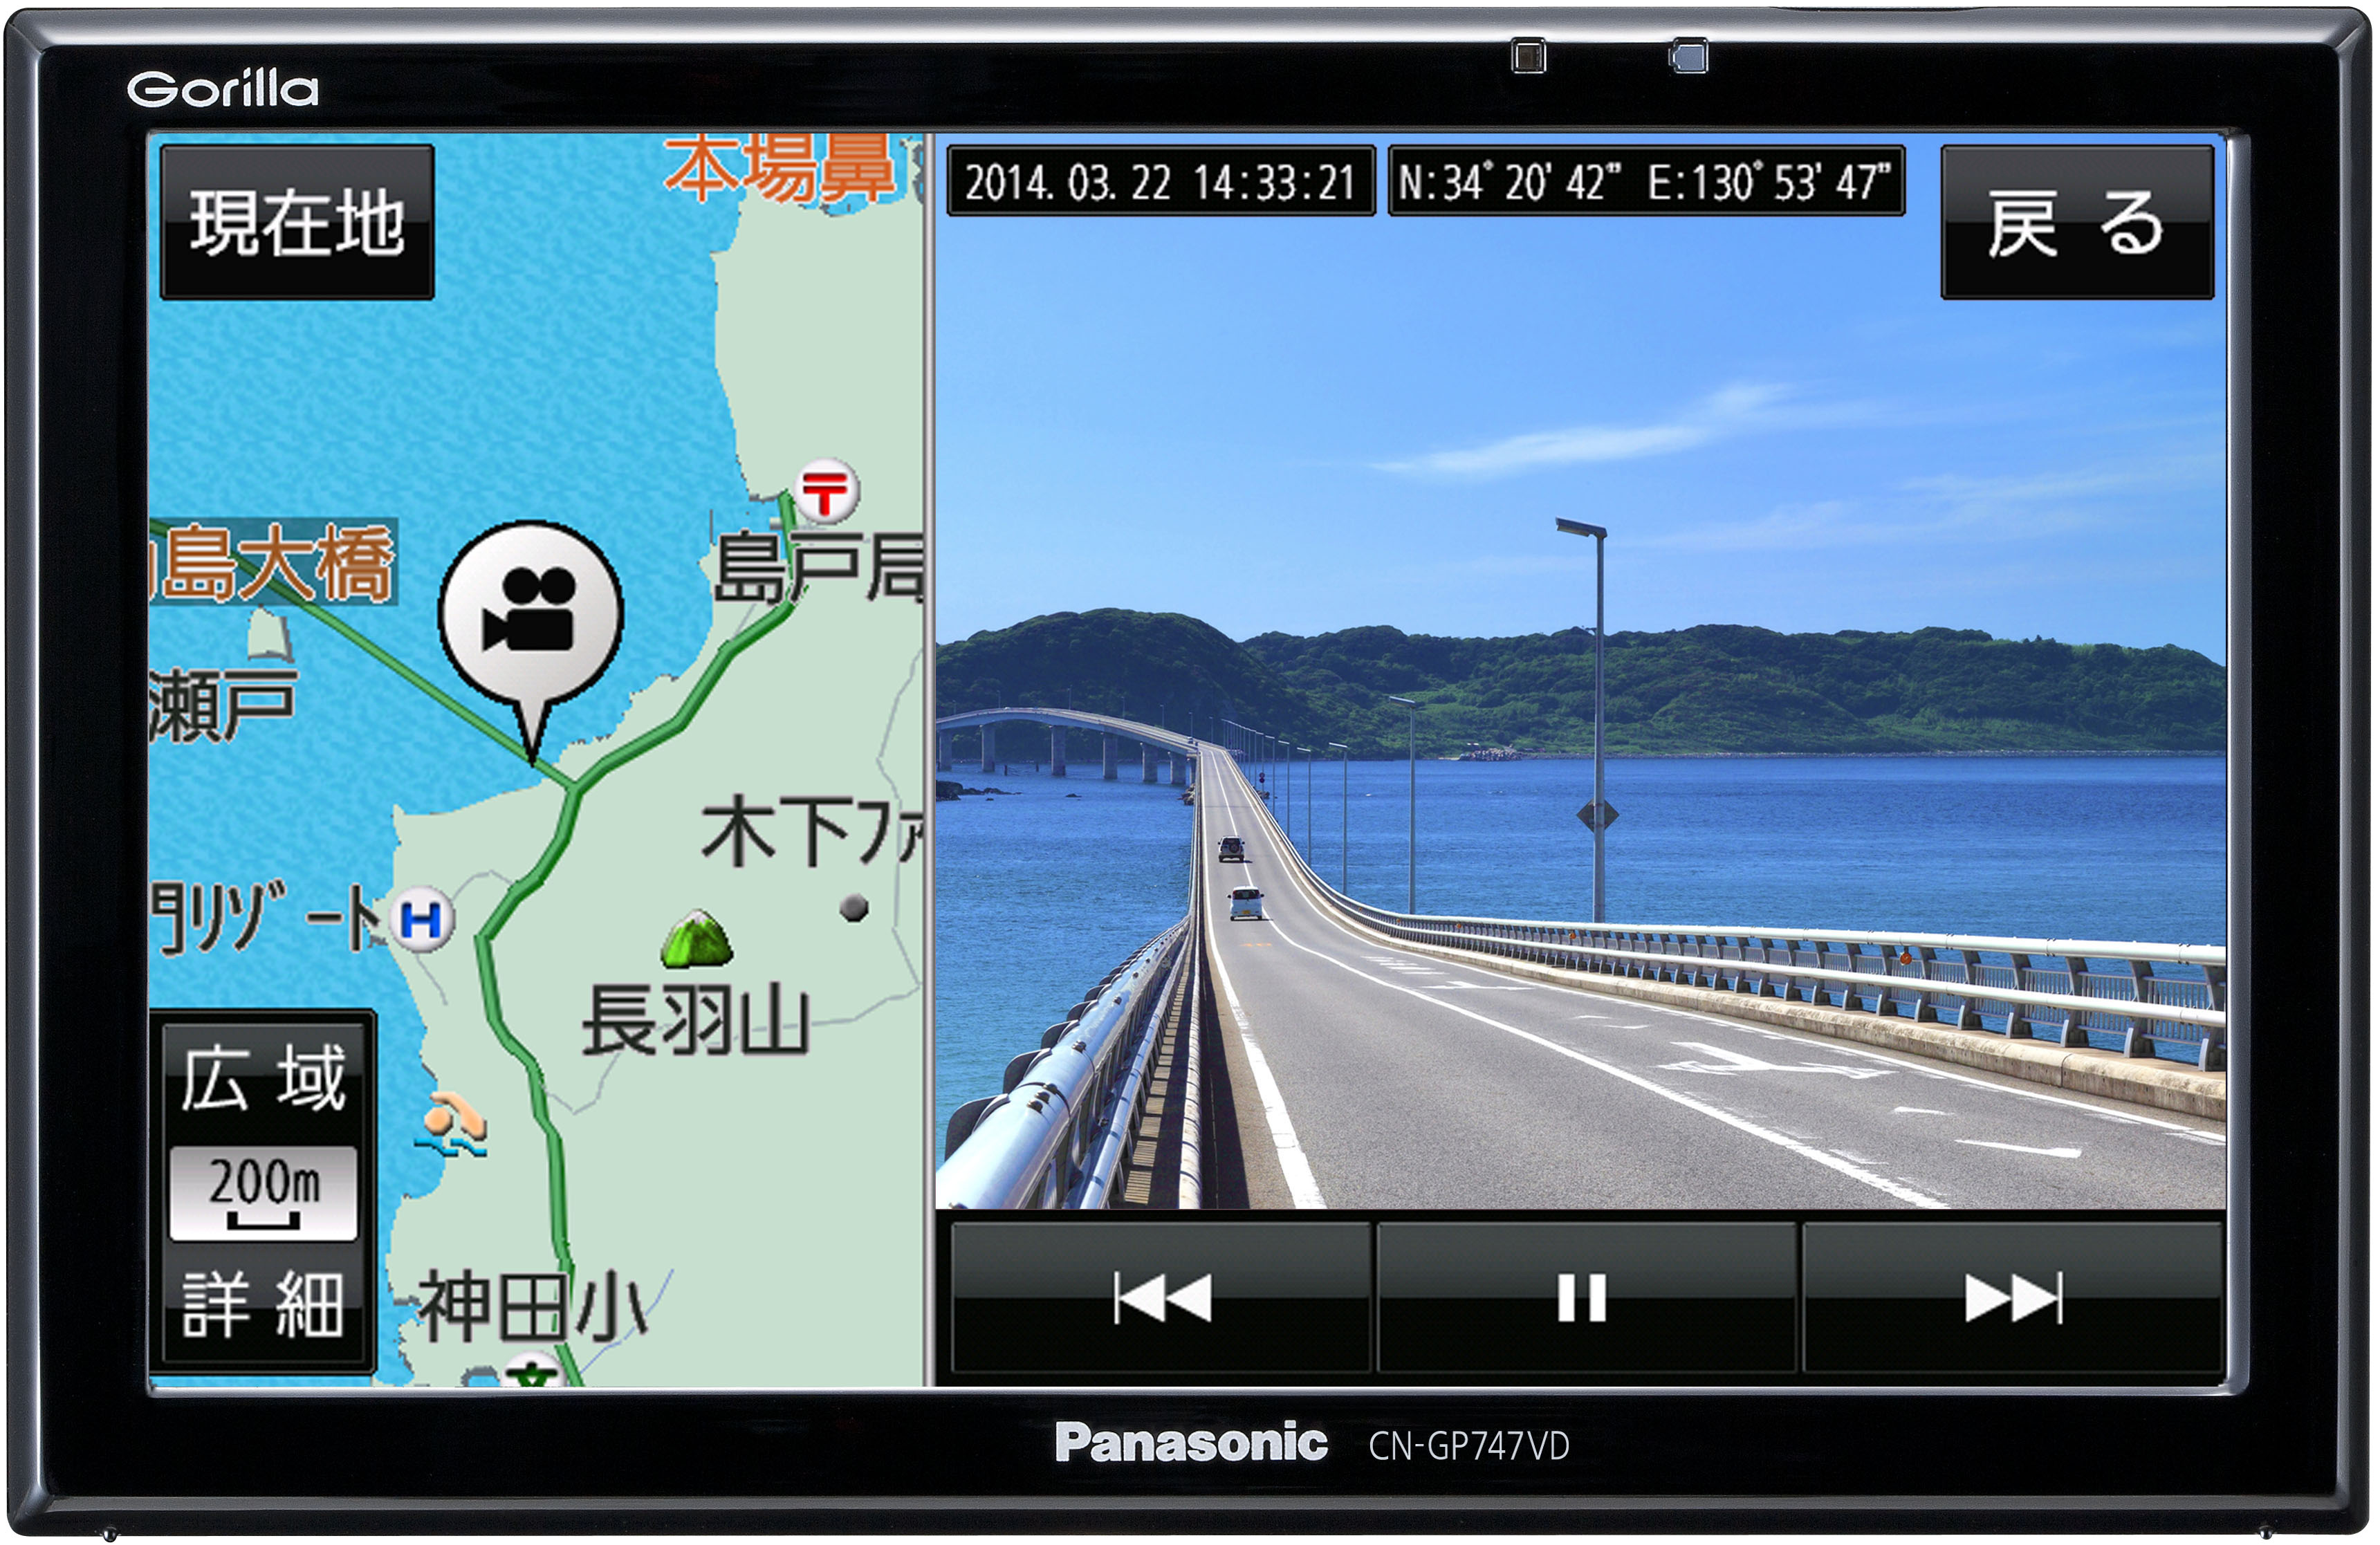 SSDポータブルカーナビゲーション ゴリラアイ CN-GP747VD